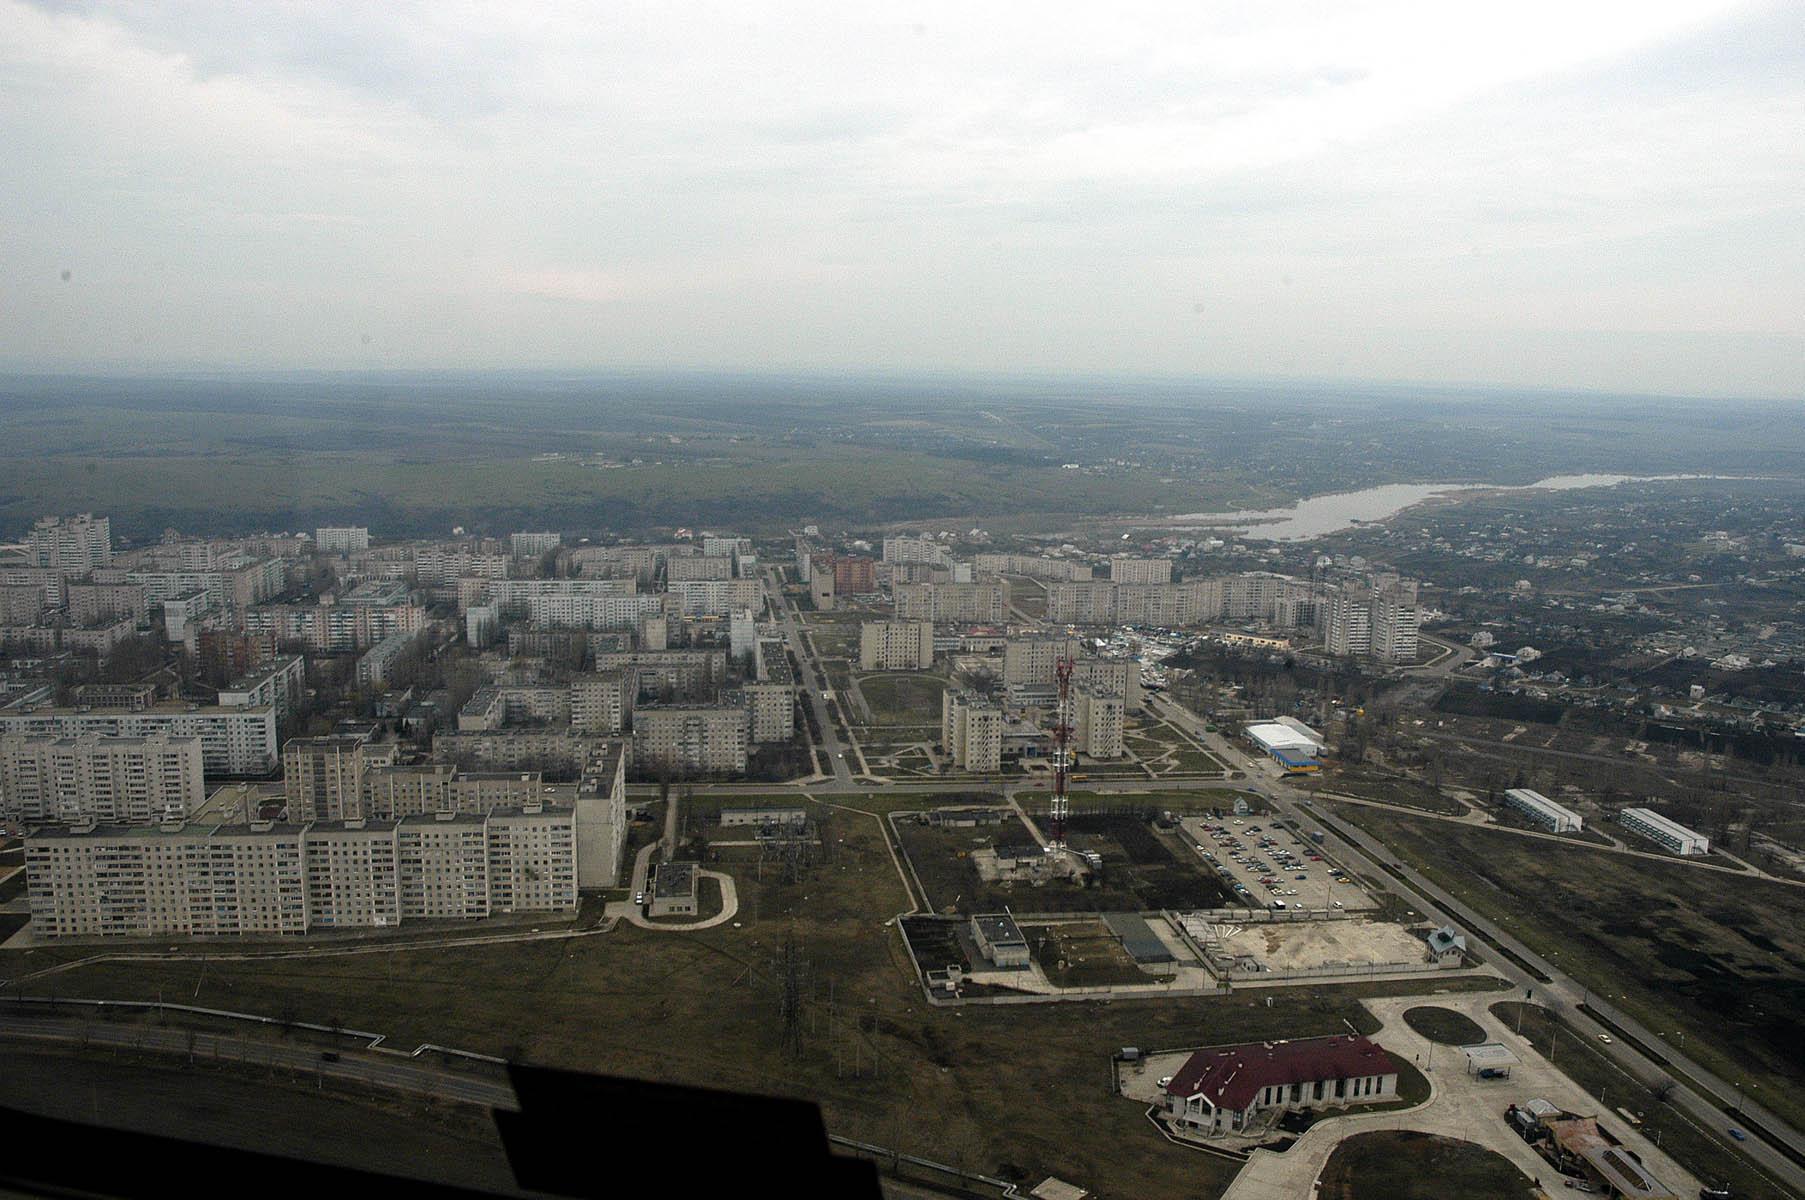 Yuzhnoukrainsk: a selection of sites